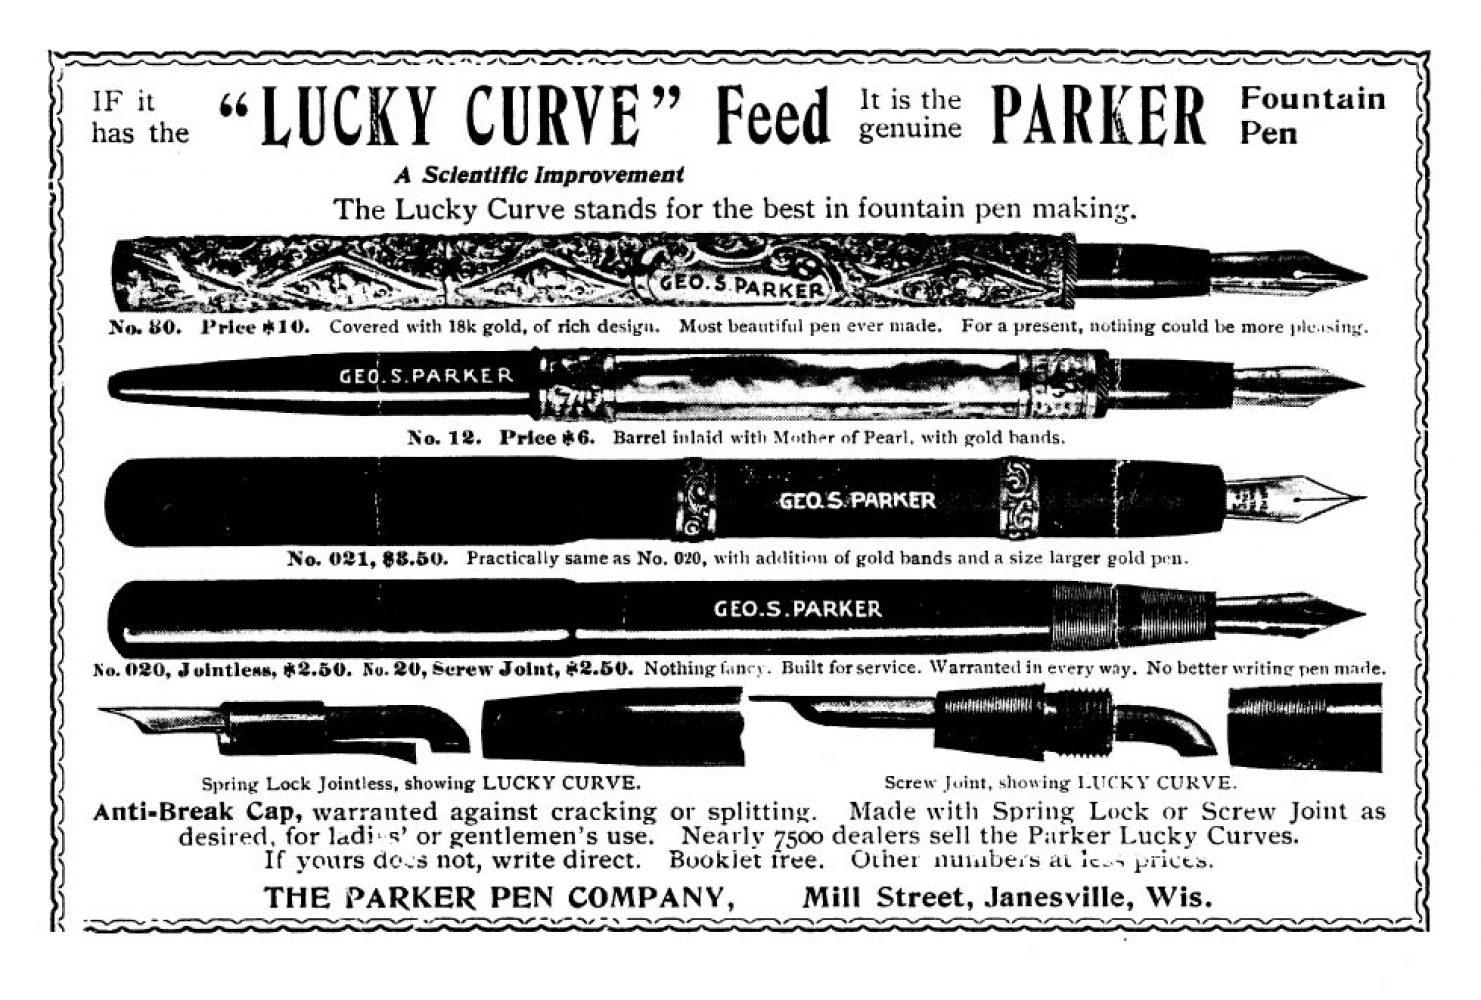 1902 a scientific improvement